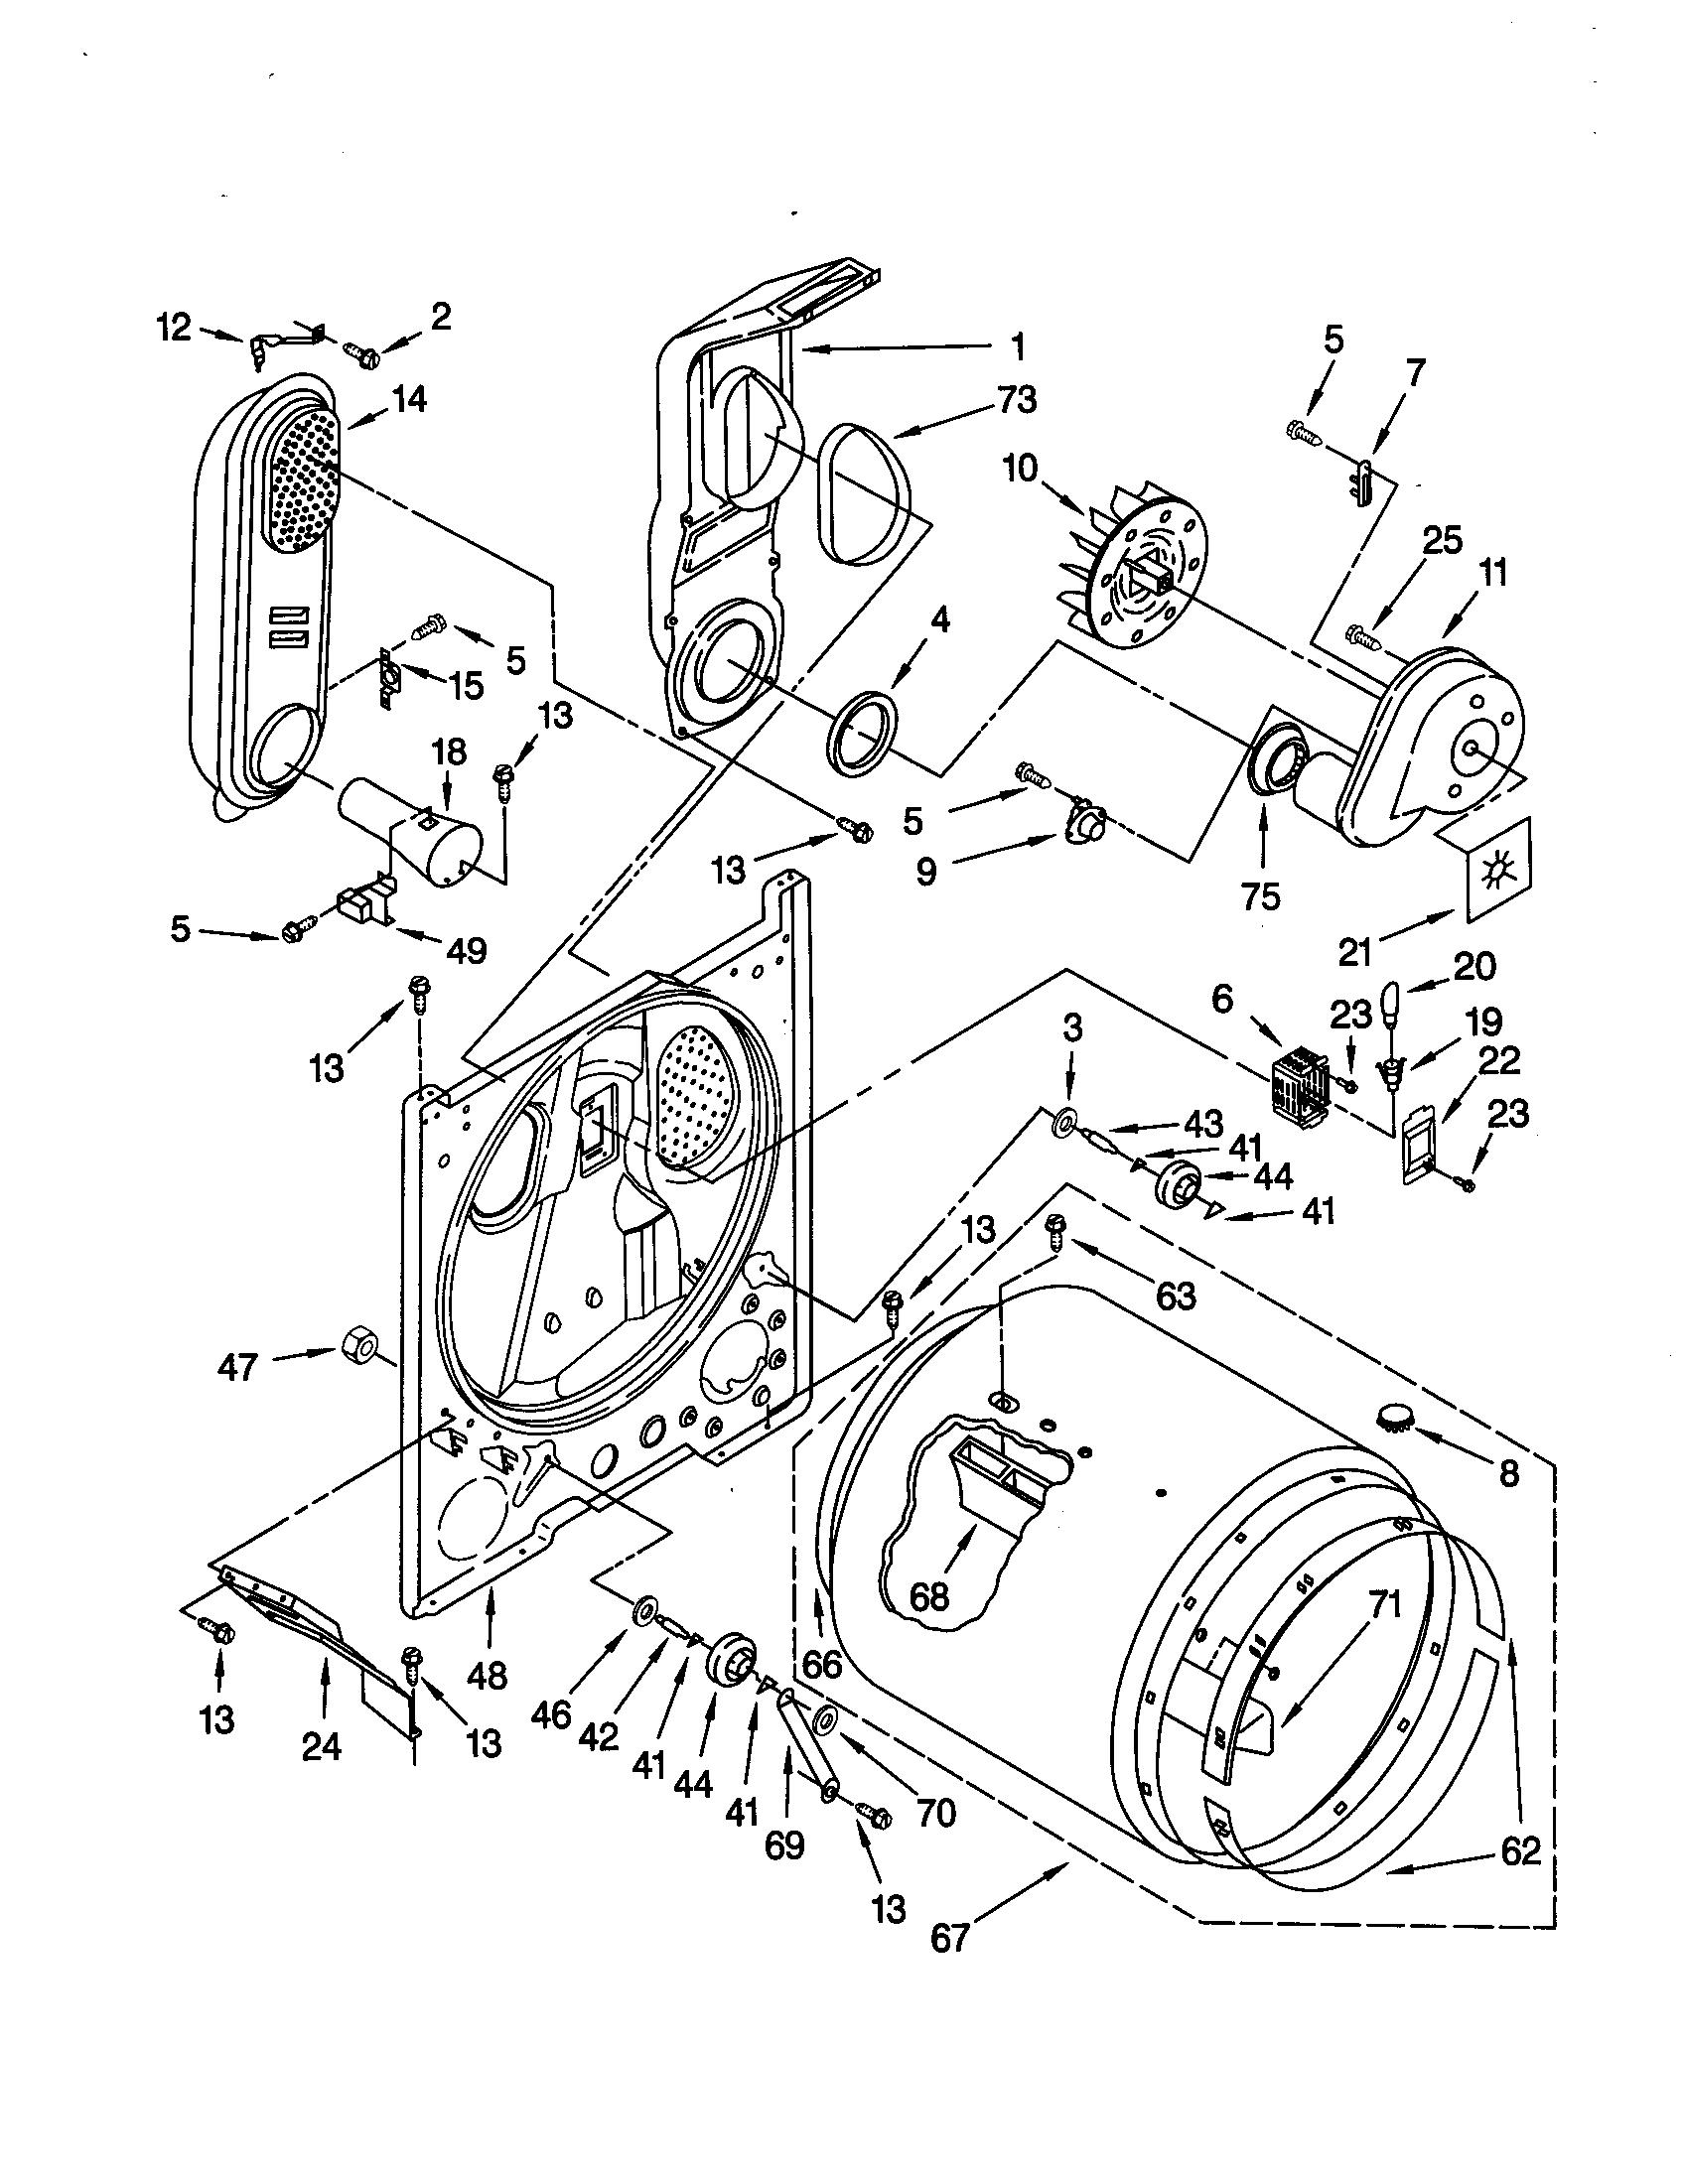 Whirlpool Lgr Jq0 Drum Support Roller Kit